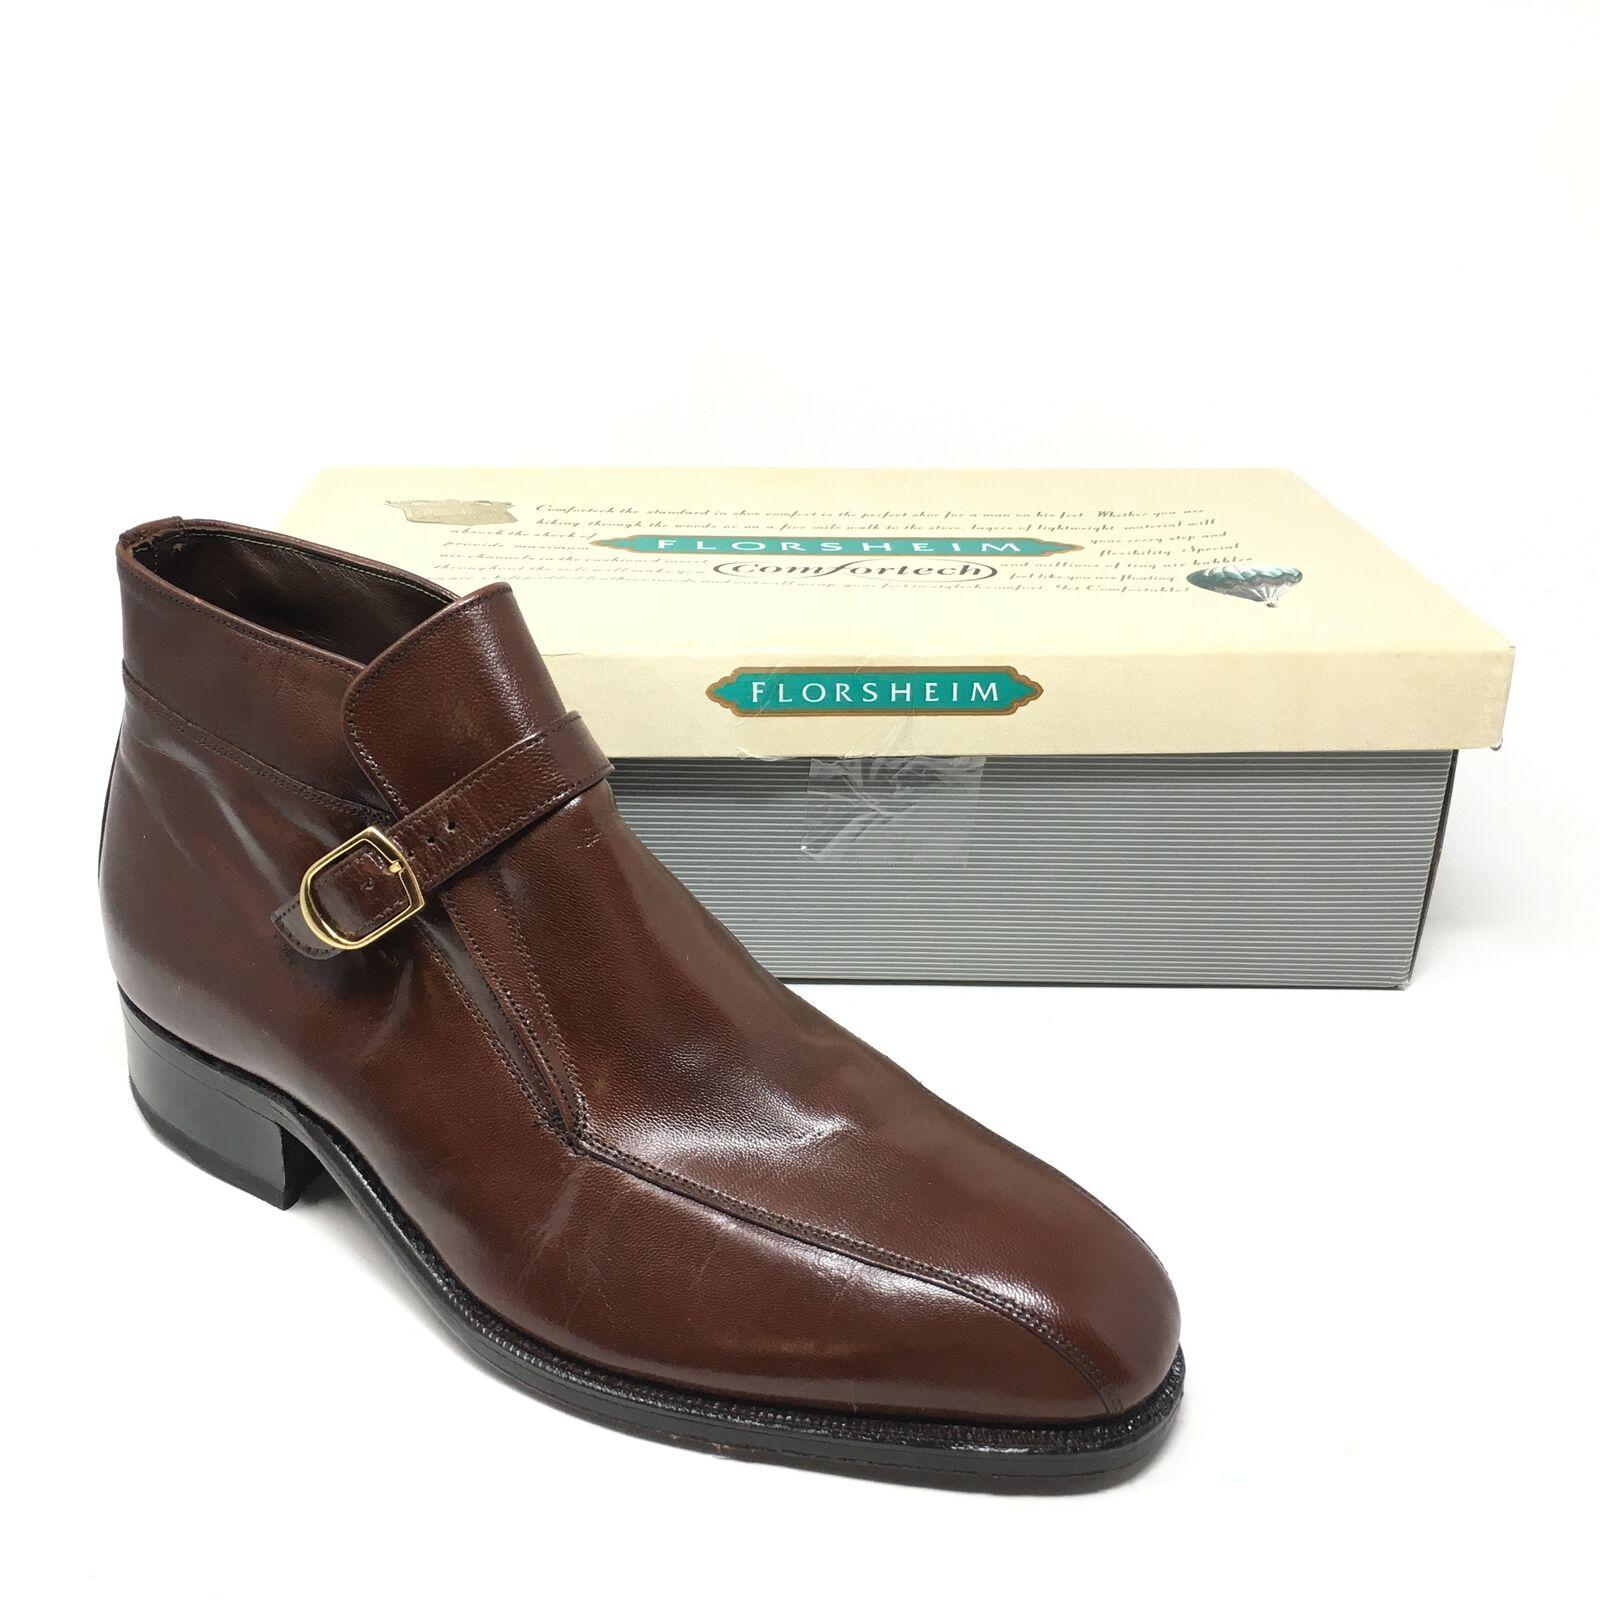 Men's NEW Florsheim Imperial Camdon Demi Ankle Boots shoes Size 9D Brown Q15